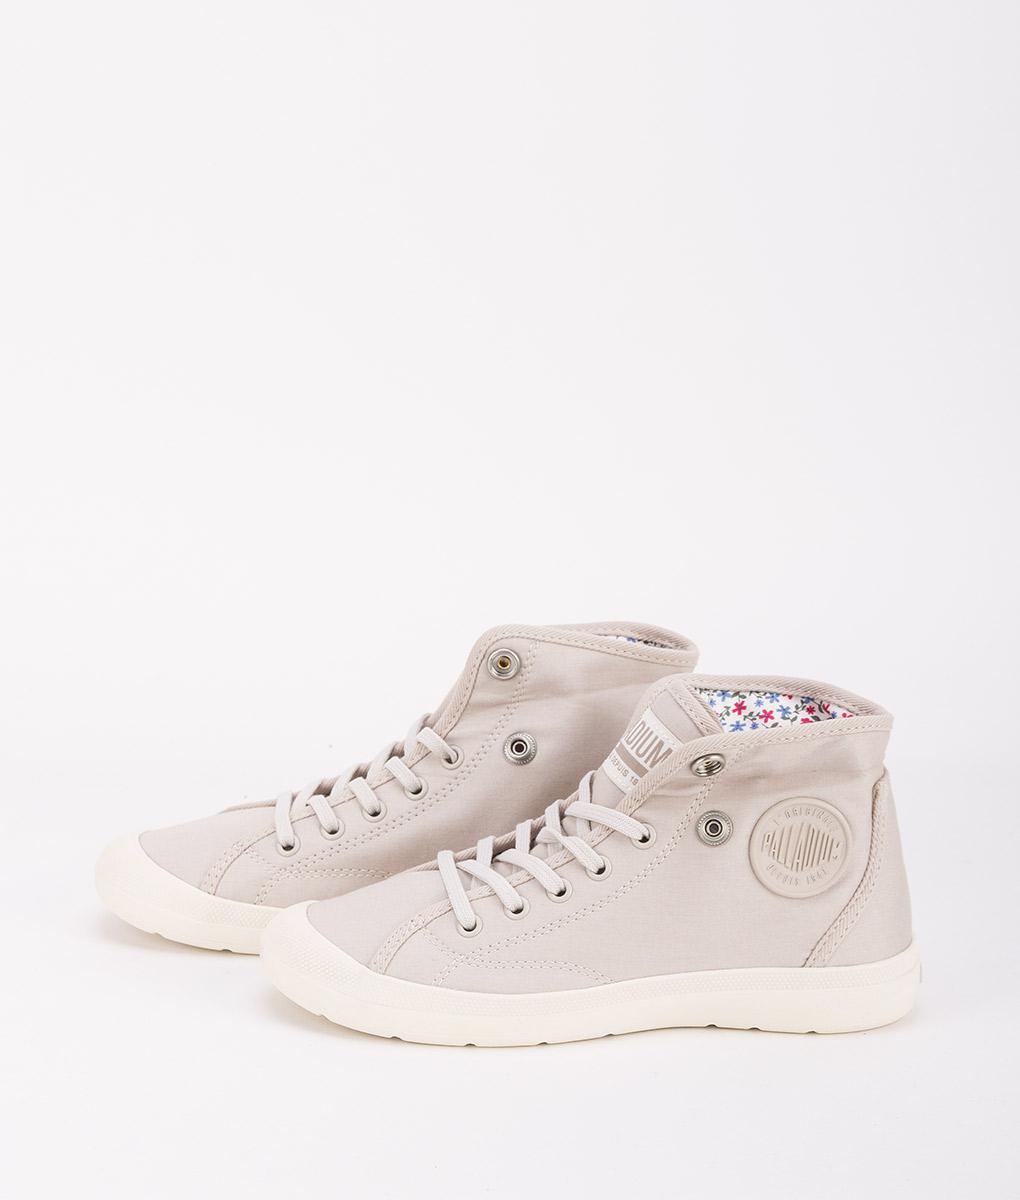 PALLADIUM Women Sneakers 95680 AVENTURE, Rayny Day Marshmellow 69.99